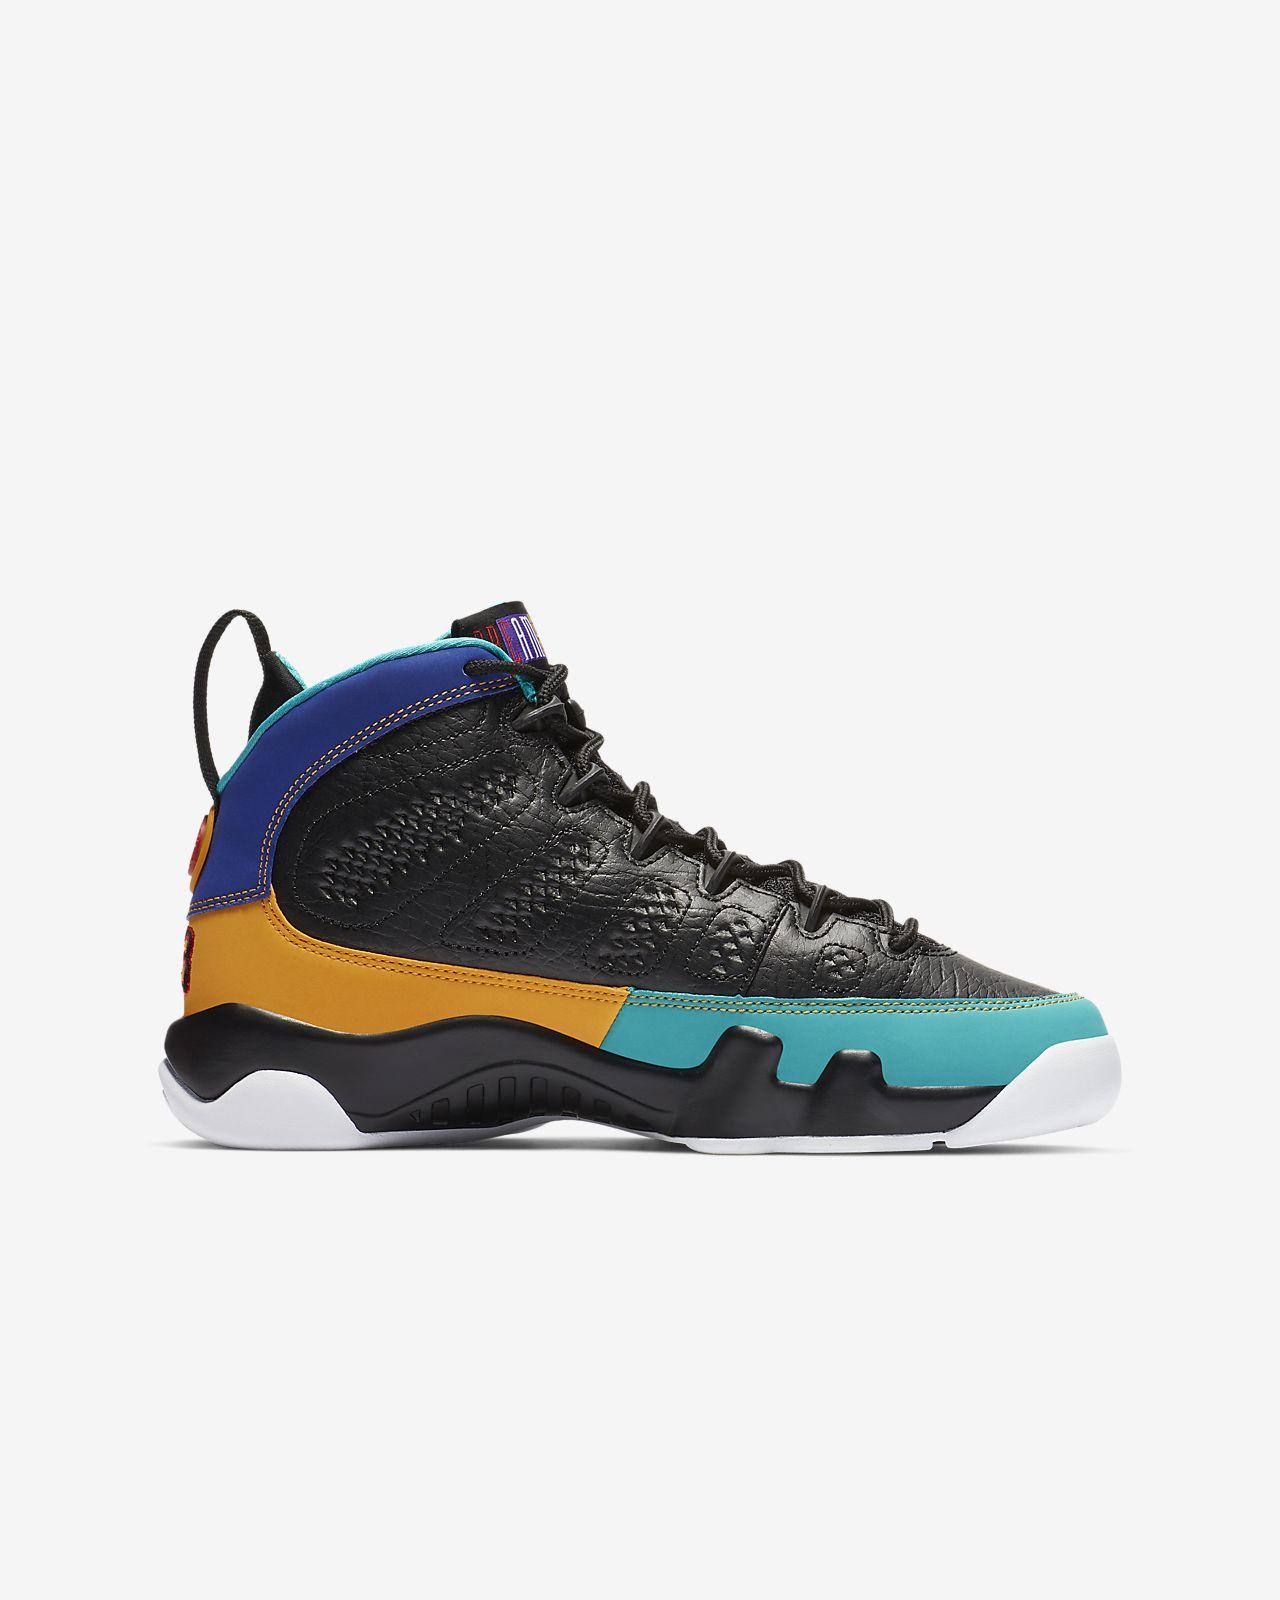 88884cee3d3044 Air Jordan 9 Retro Big Kids  Shoe. Nike.com